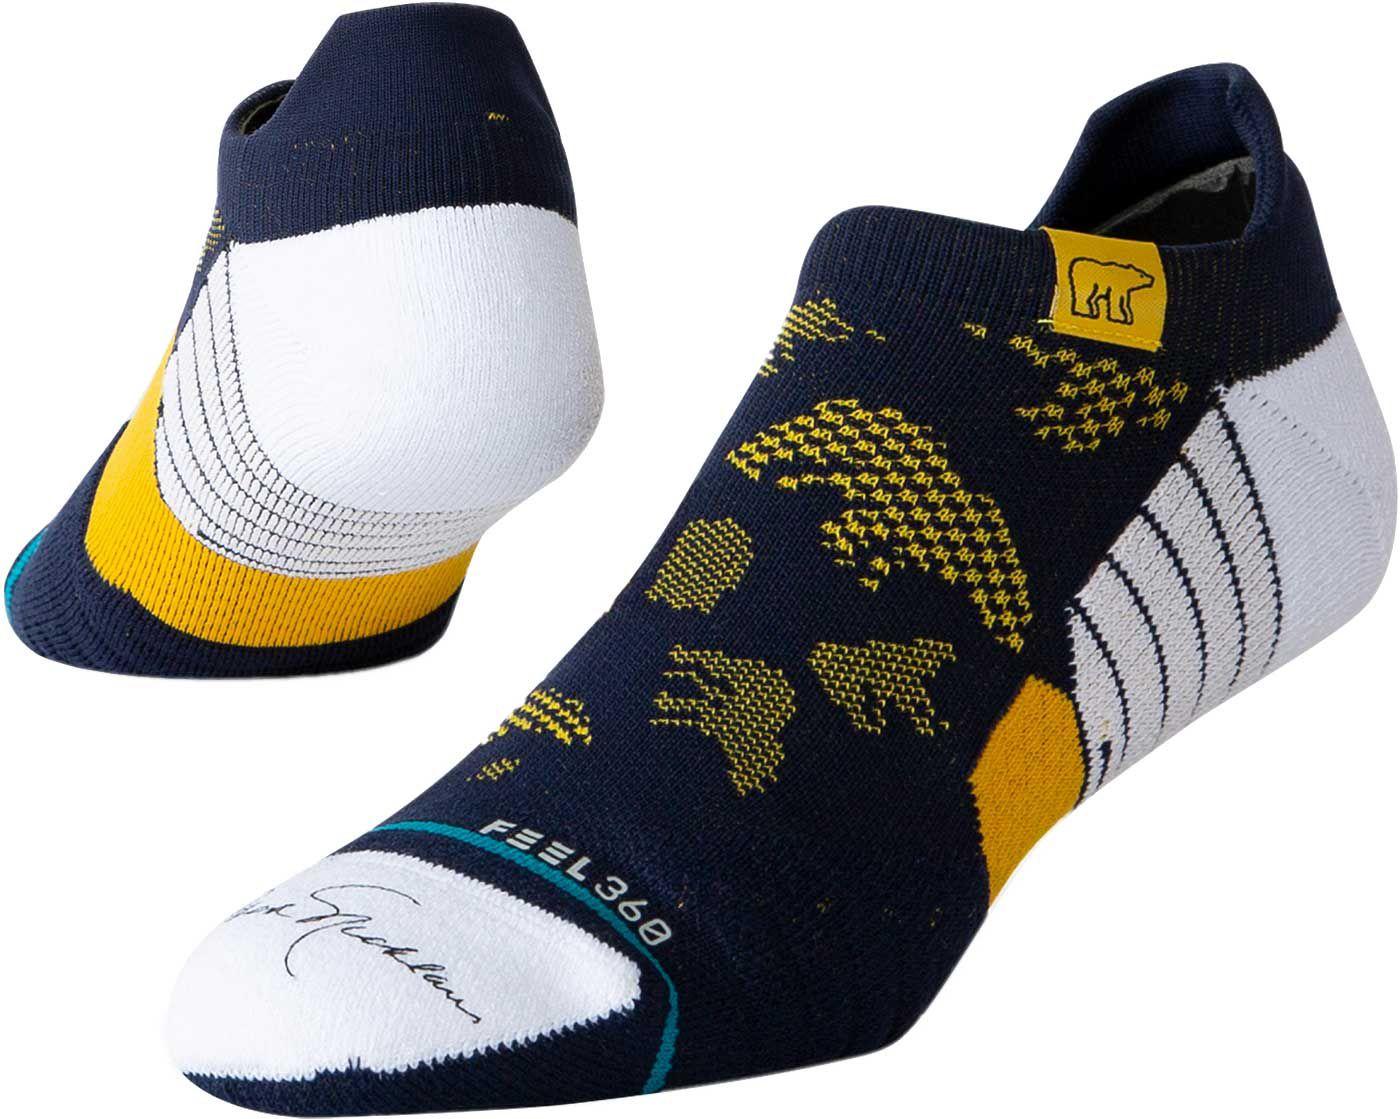 Stance Men's Jack Nicklaus Tab Golf Socks